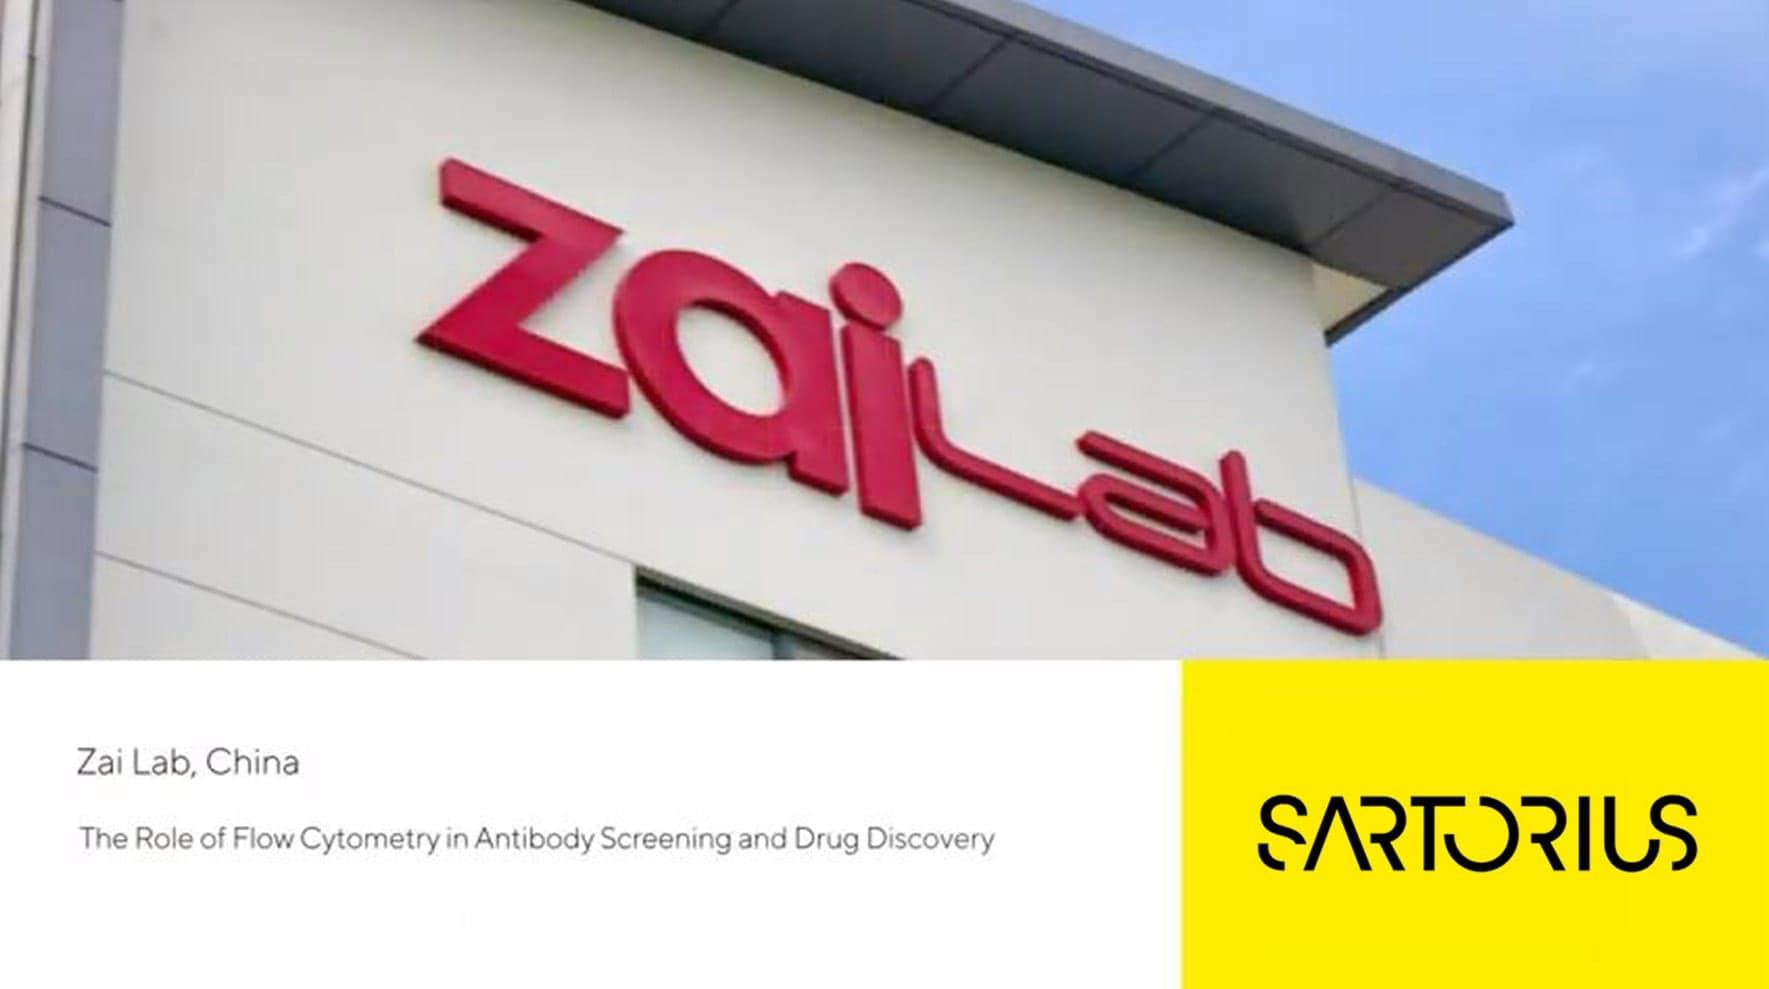 Watch the Zai Lab, China Antibody Discovery Video